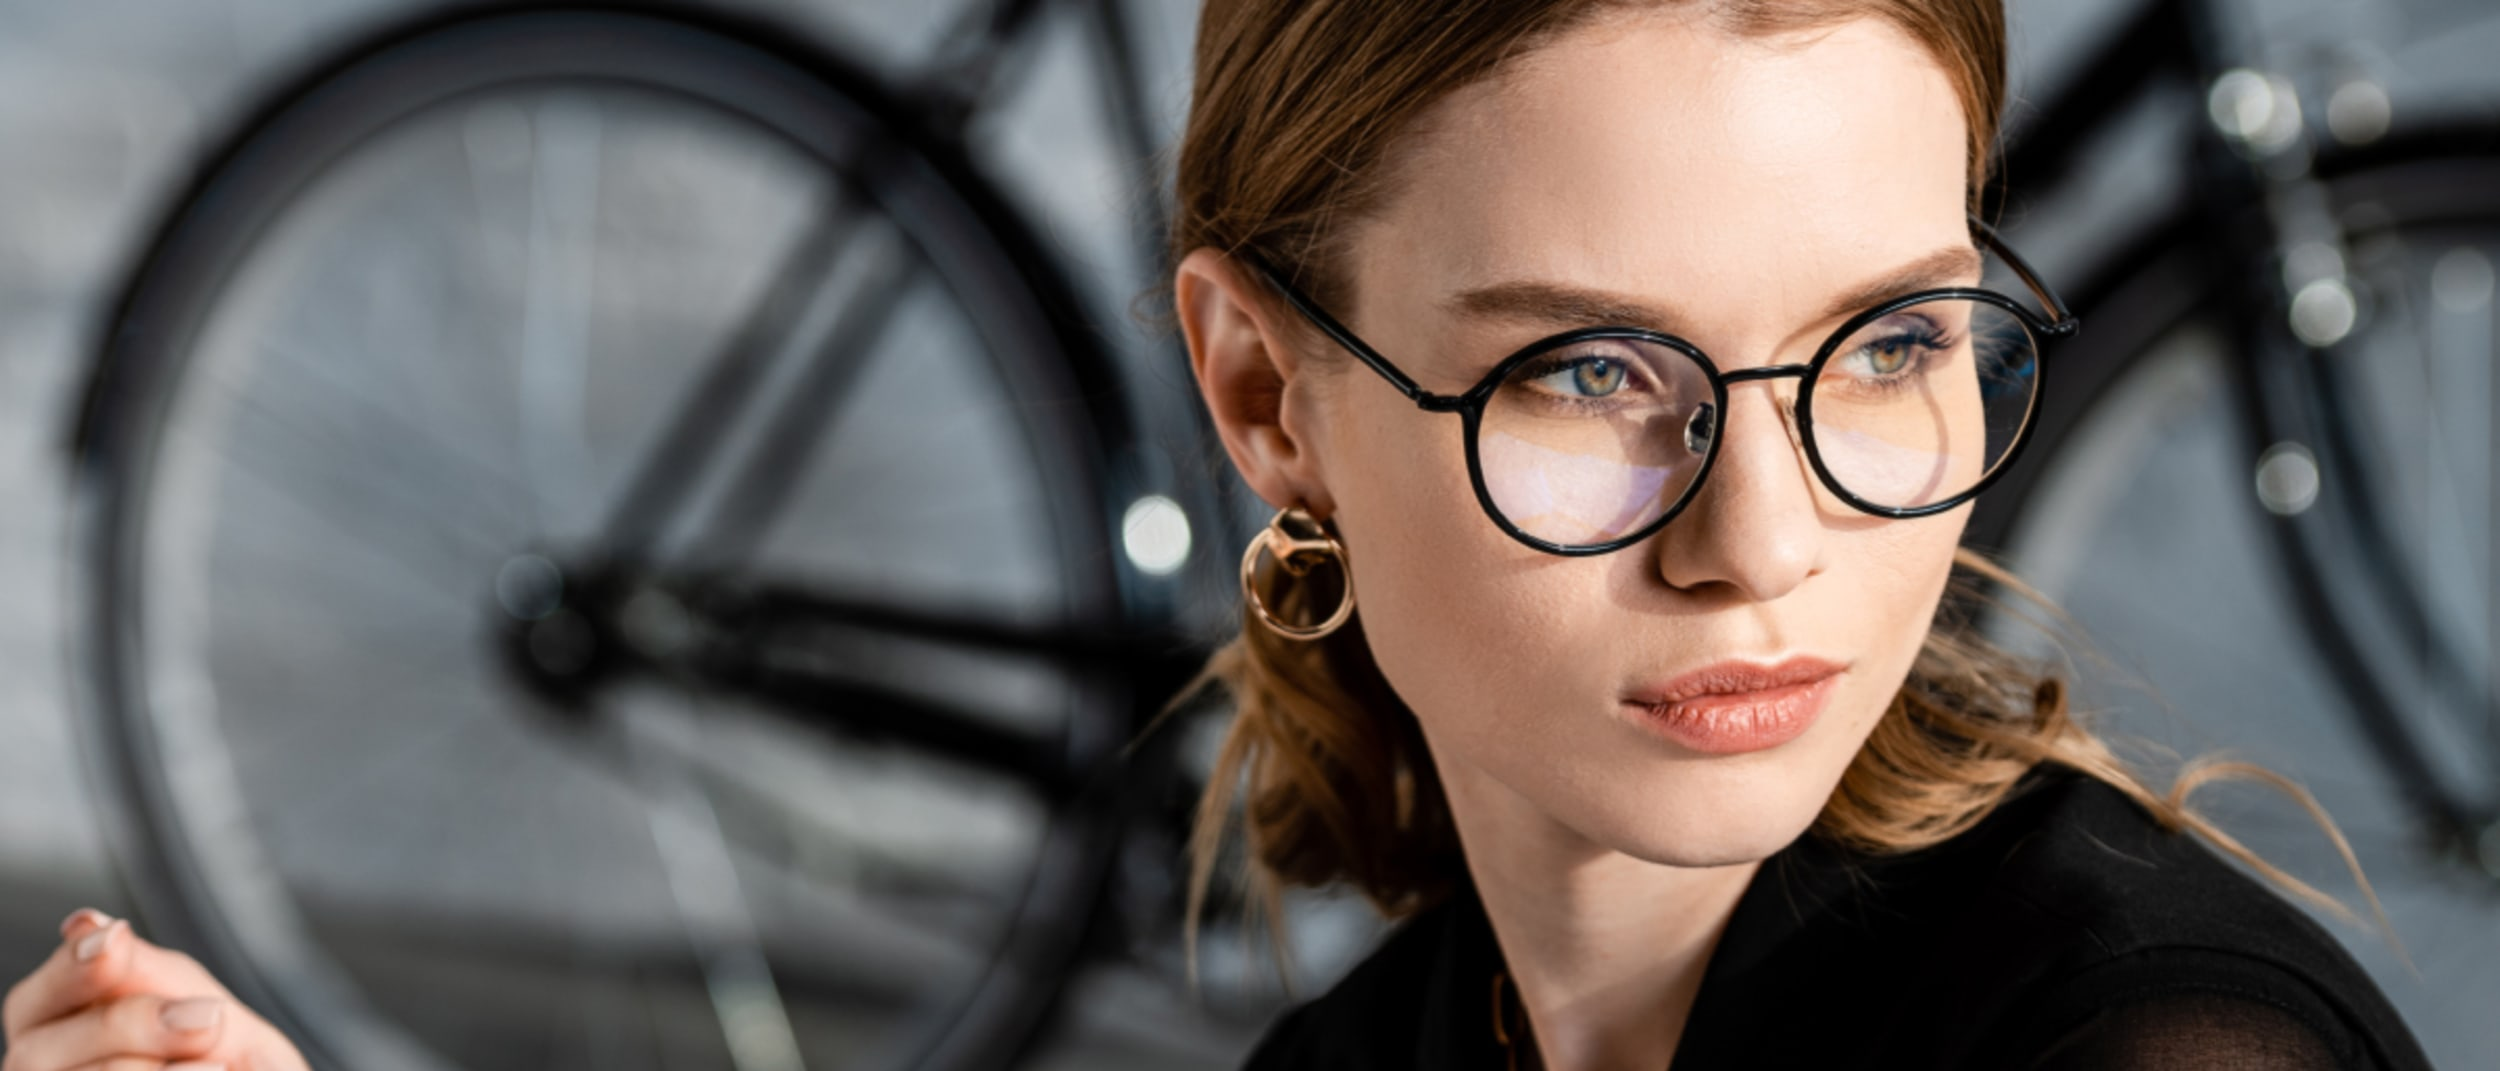 Torga Optical: Up to 50% off frames on Mondays